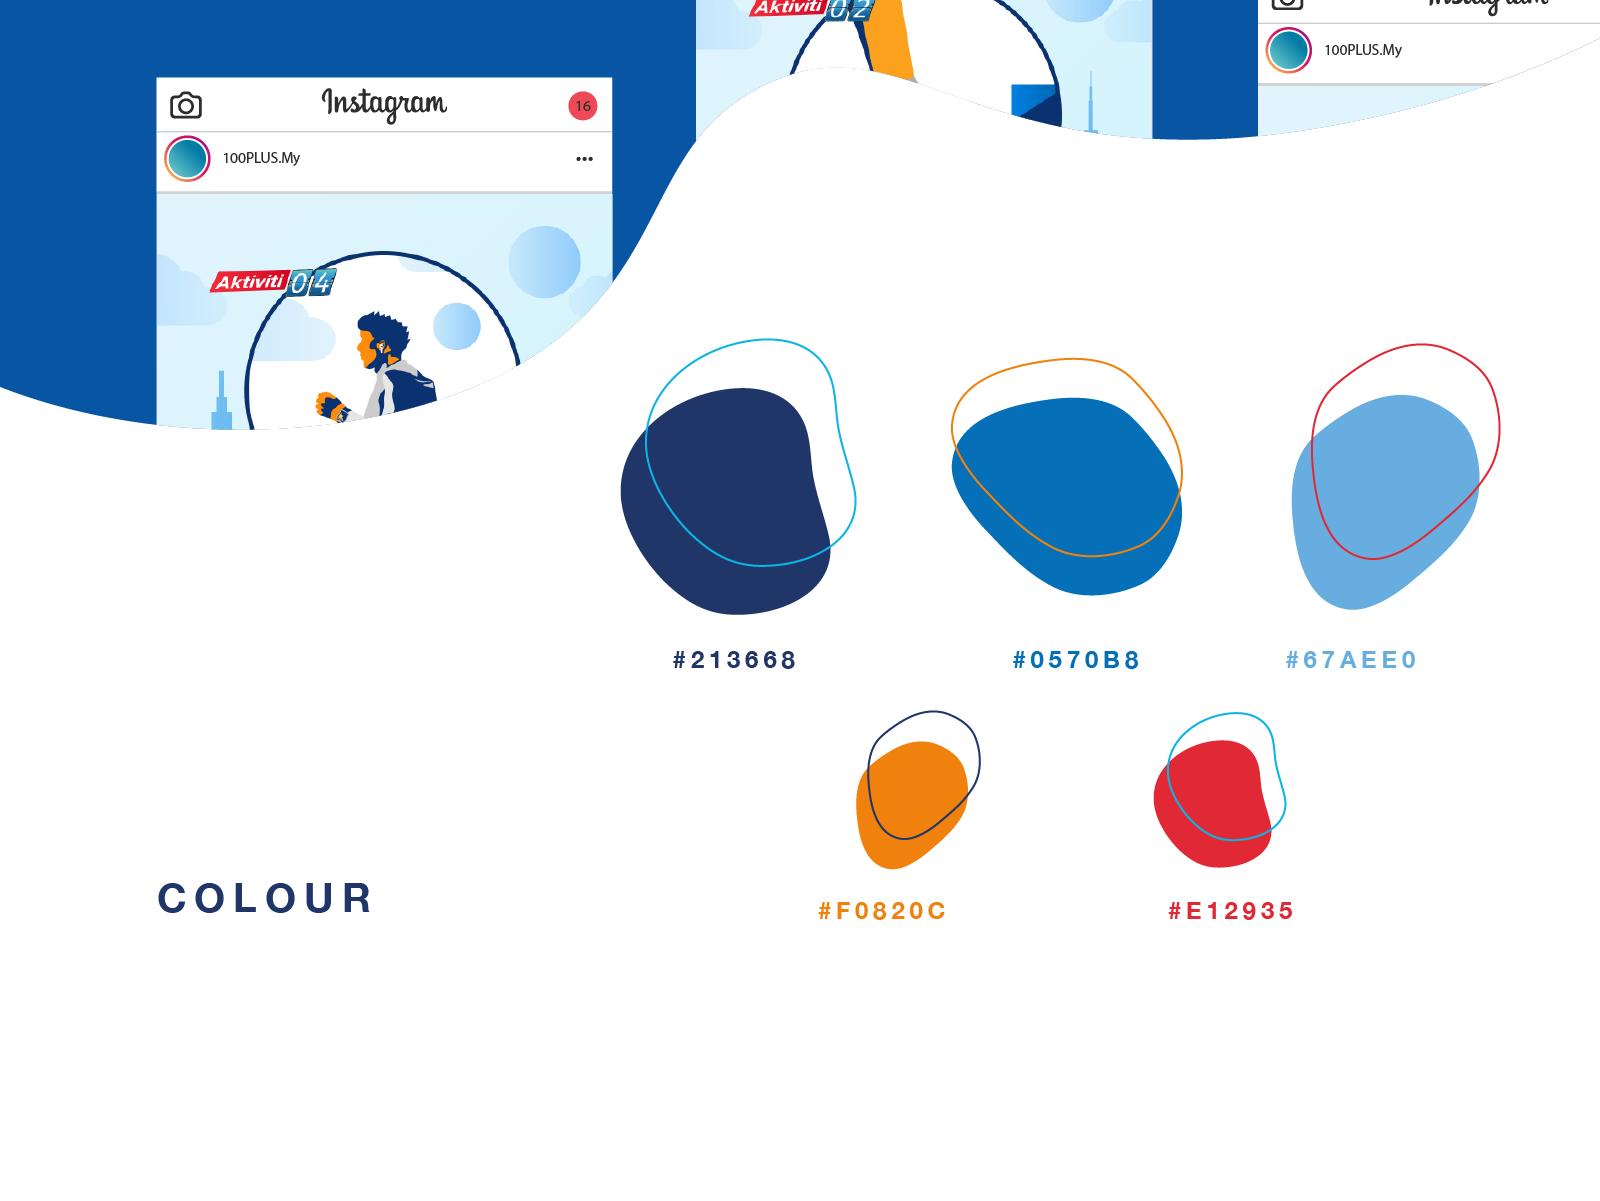 100Plus Aktifkan Malaysiaku 100,000 Steps Challenge campaign colour usage